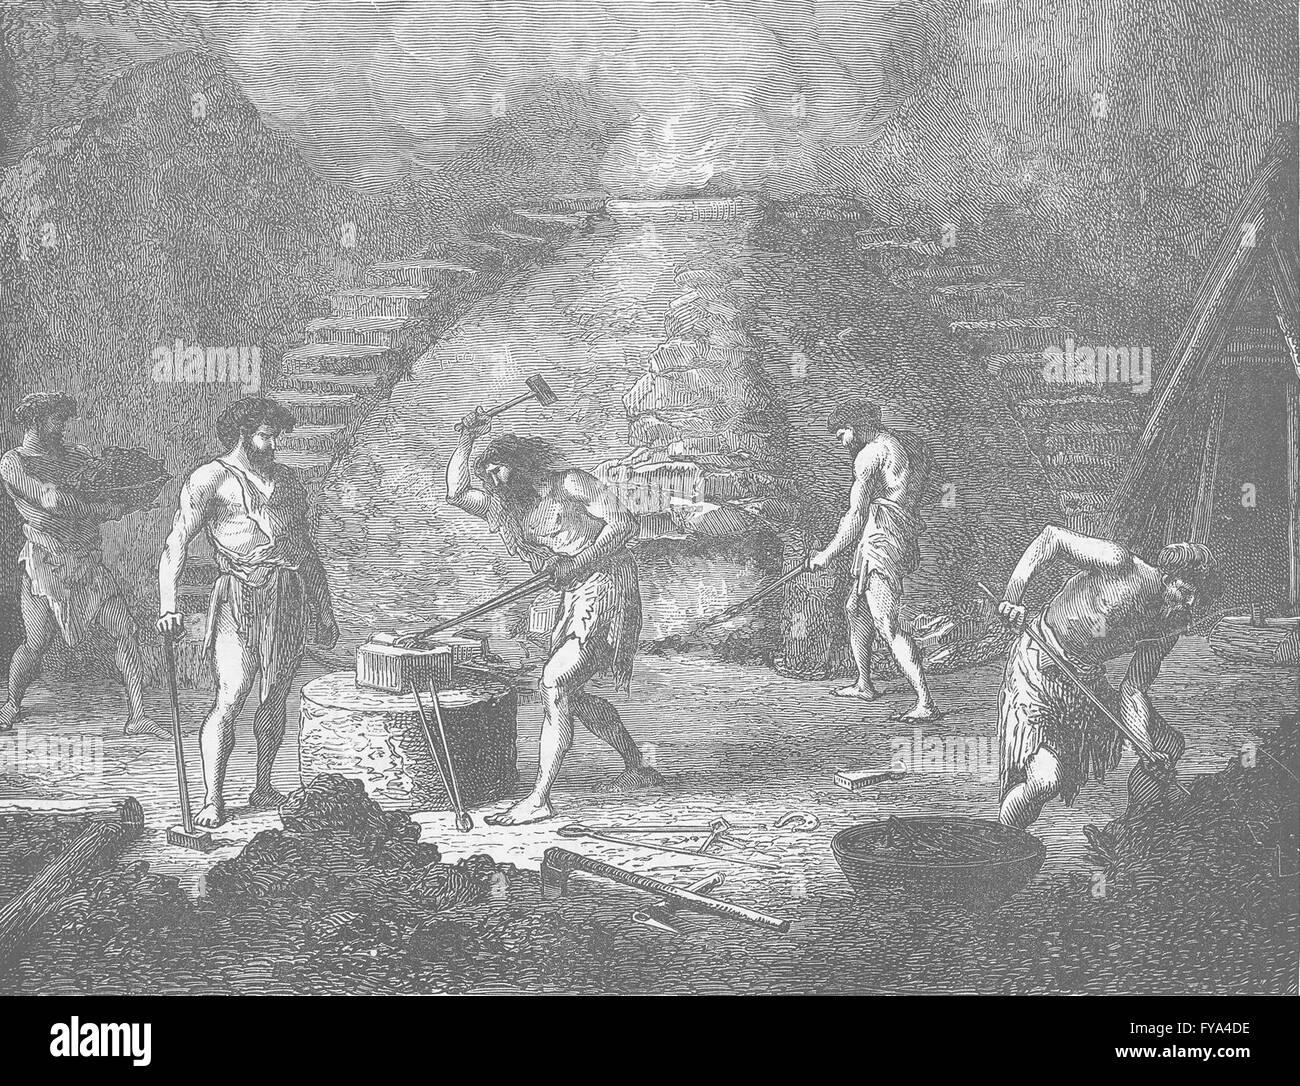 IRON AGE: Primitive furnace for smelting iron, antique print 1893 - Stock Image